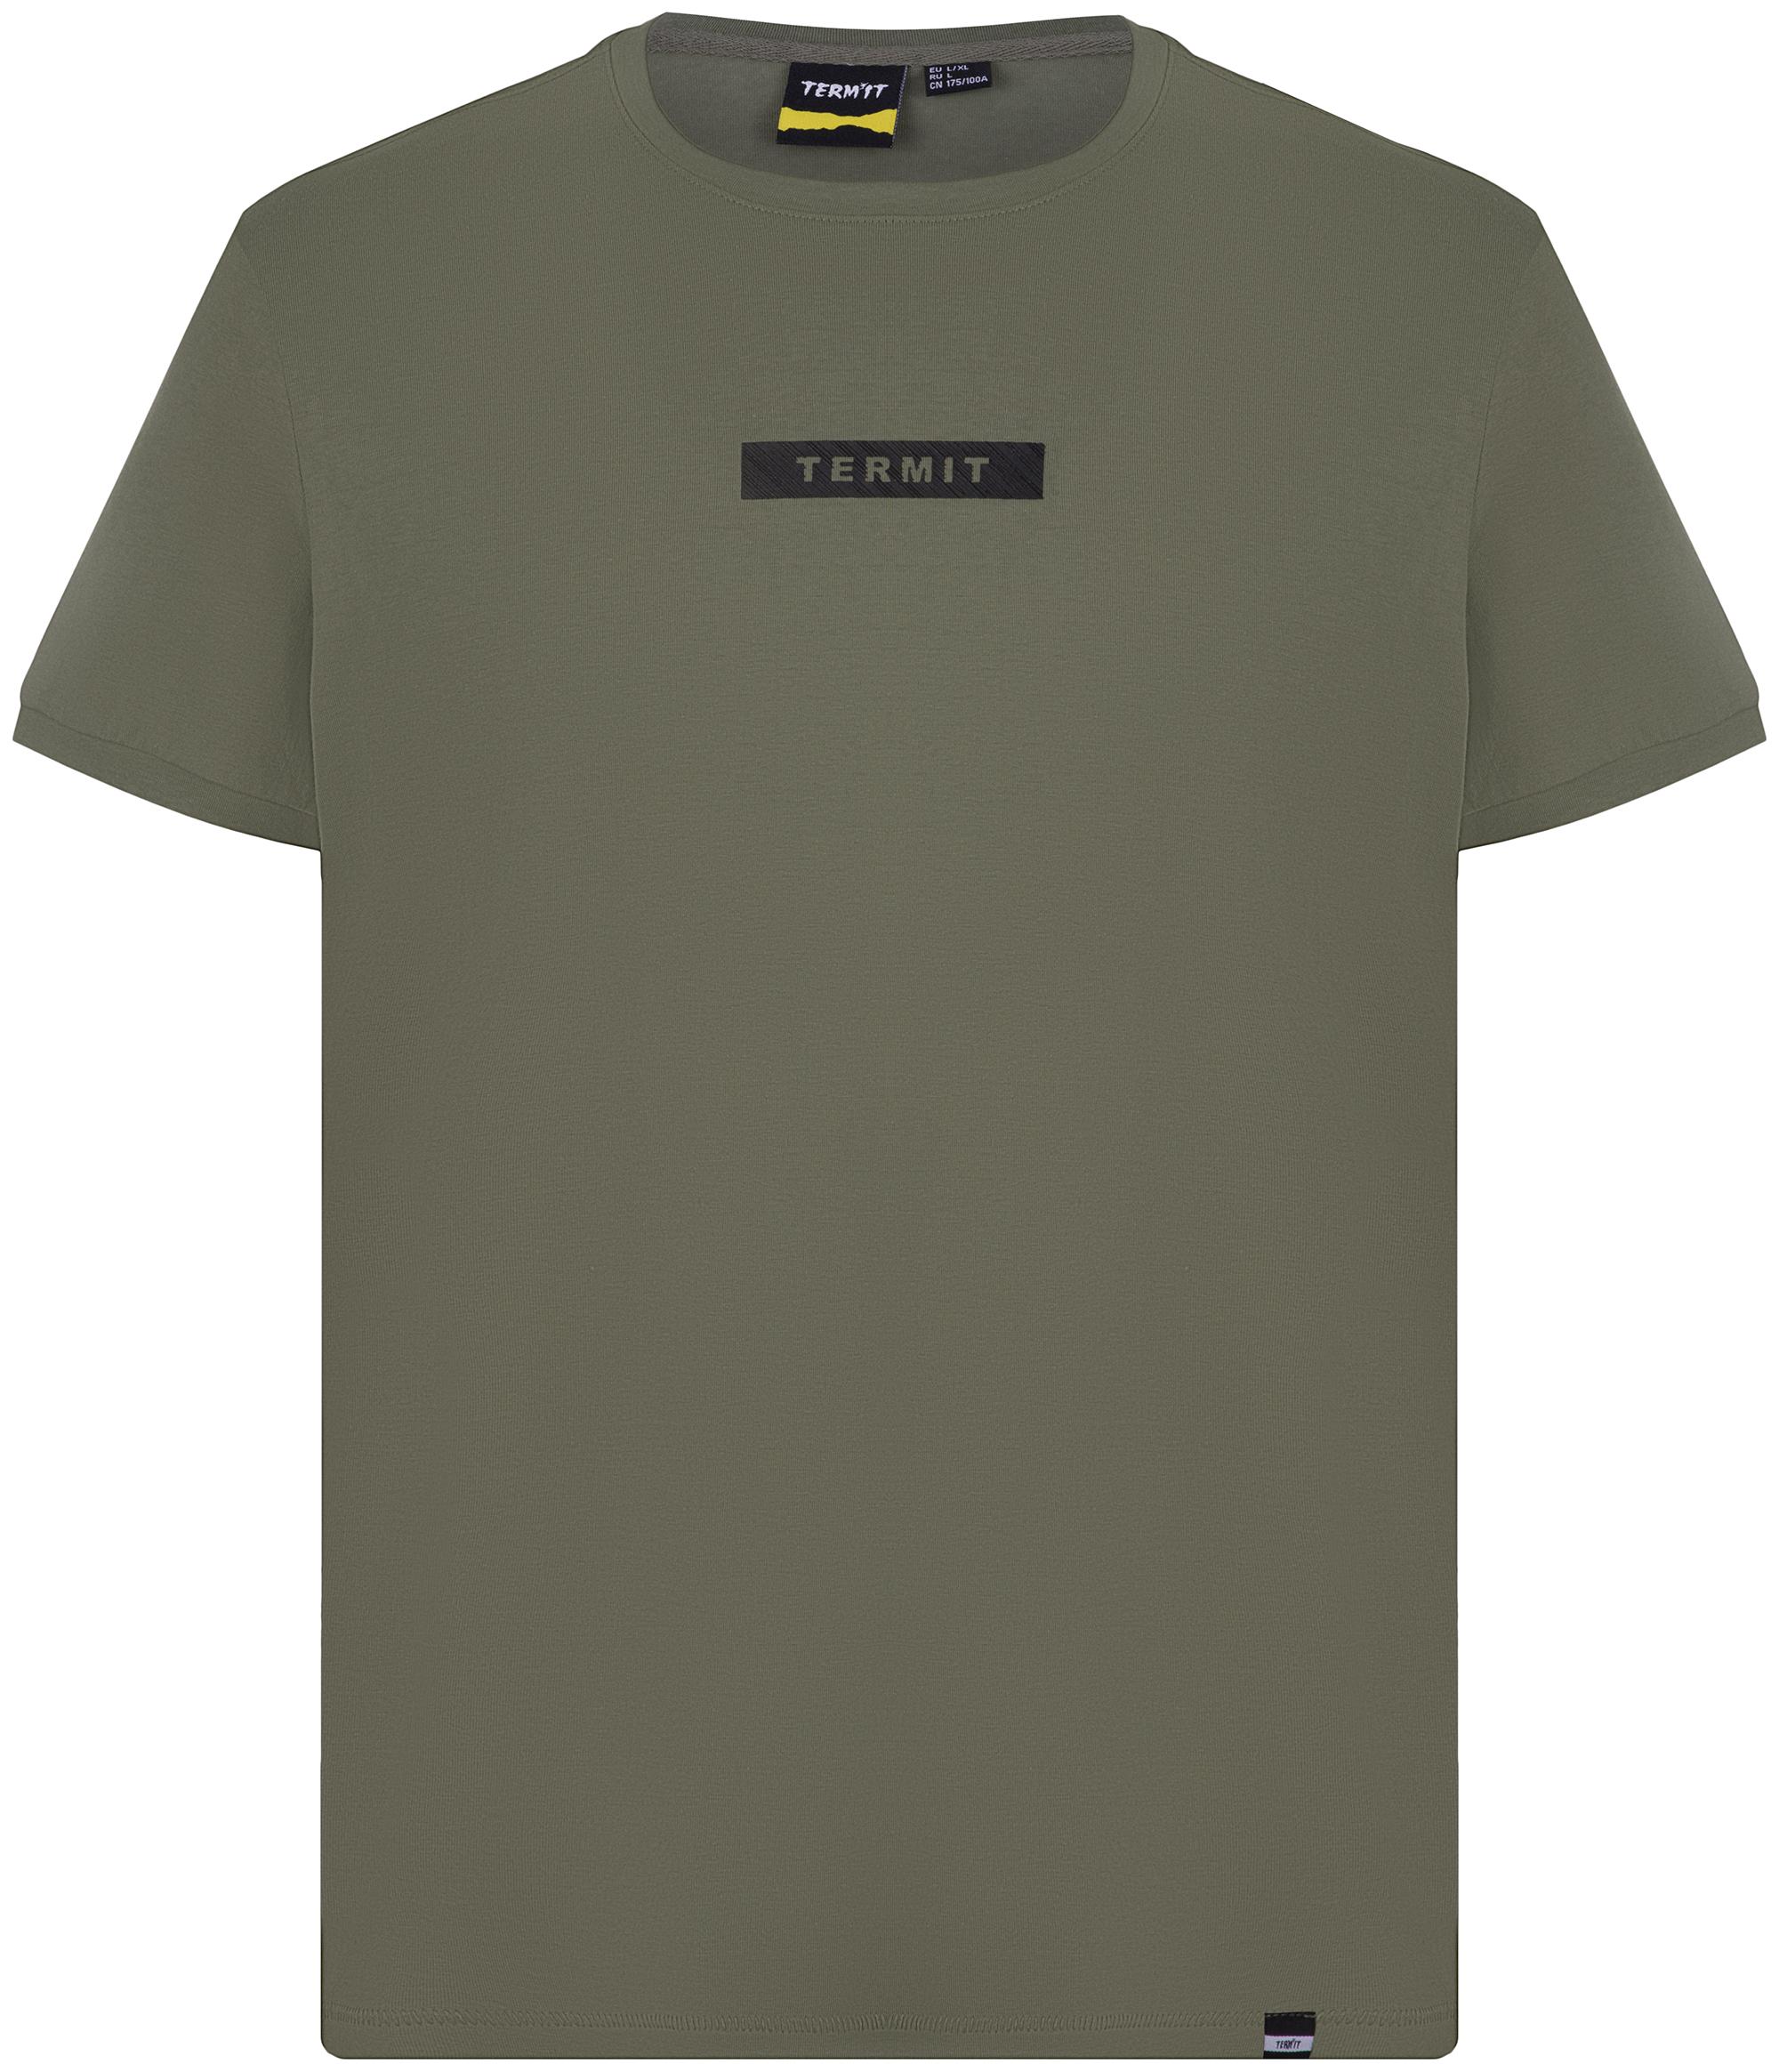 Termit Футболка мужская Termit, размер 54 футболка мужская mavi цвет белый 065283 620 размер xxl 54